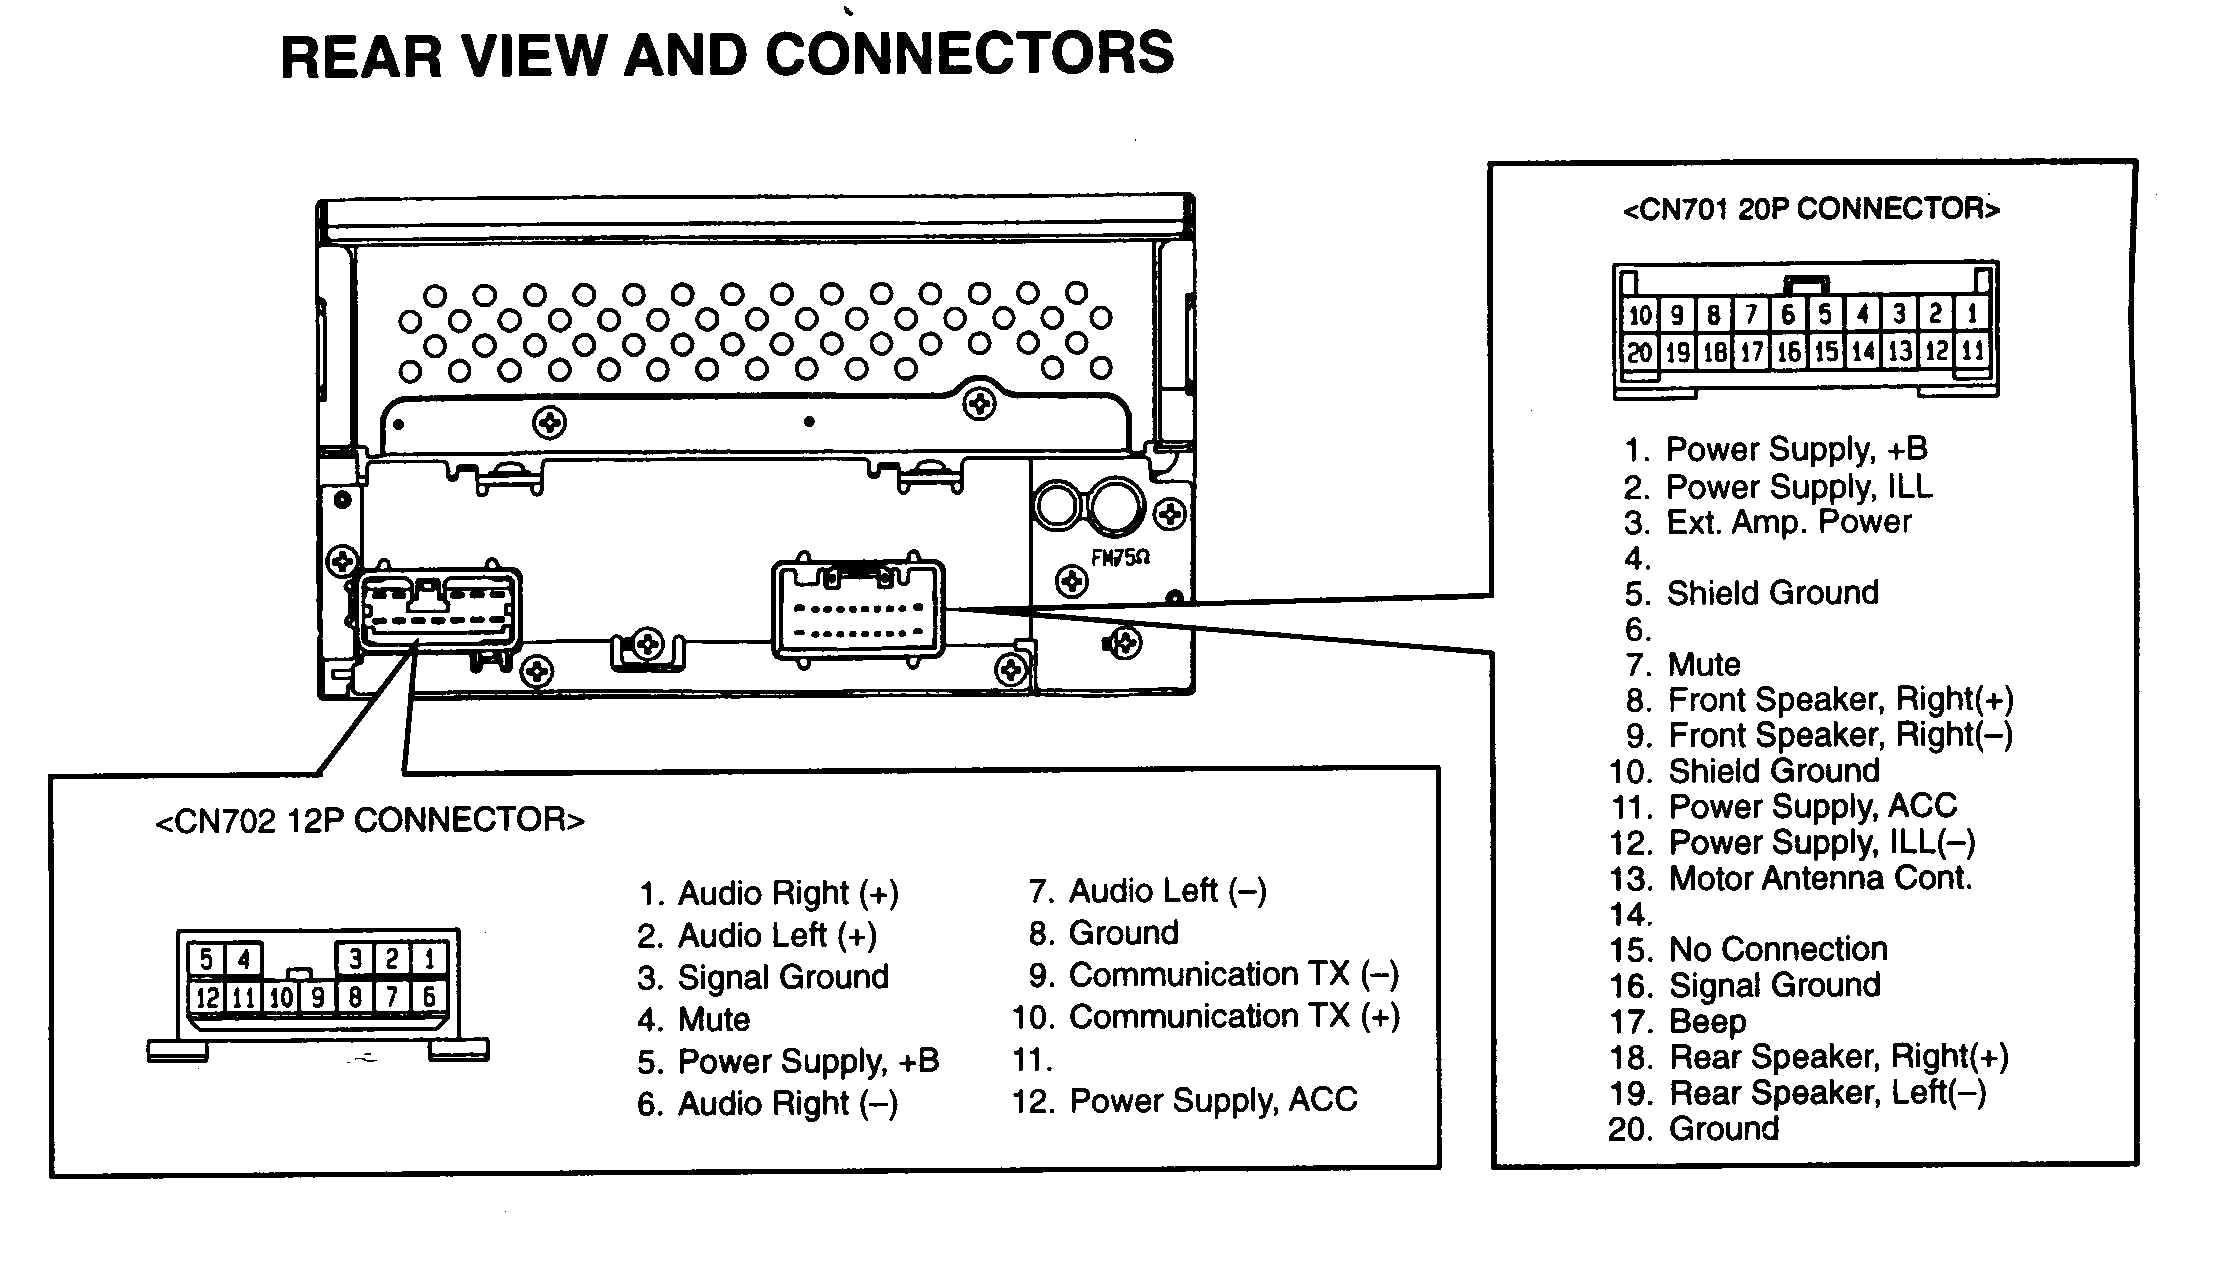 2001 Oldsmobile Aurora Engine Diagram 2001 Oldsmobile Alero Stereo Wiring Diagram 2002 Worksheet and Of 2001 Oldsmobile Aurora Engine Diagram